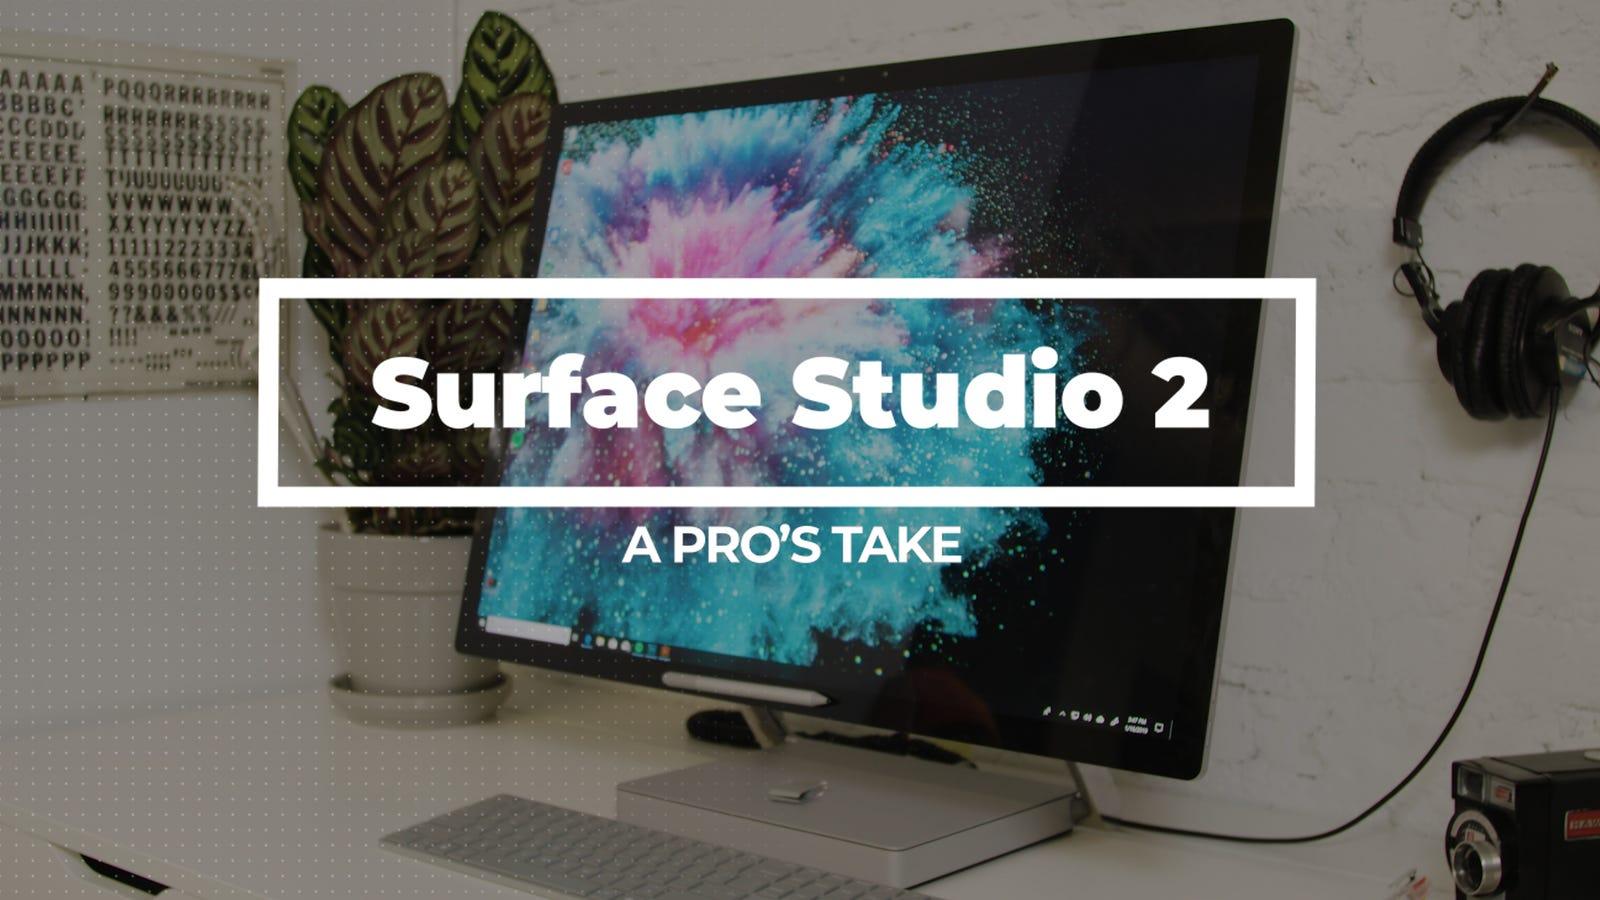 microsoft surface studio 2 price